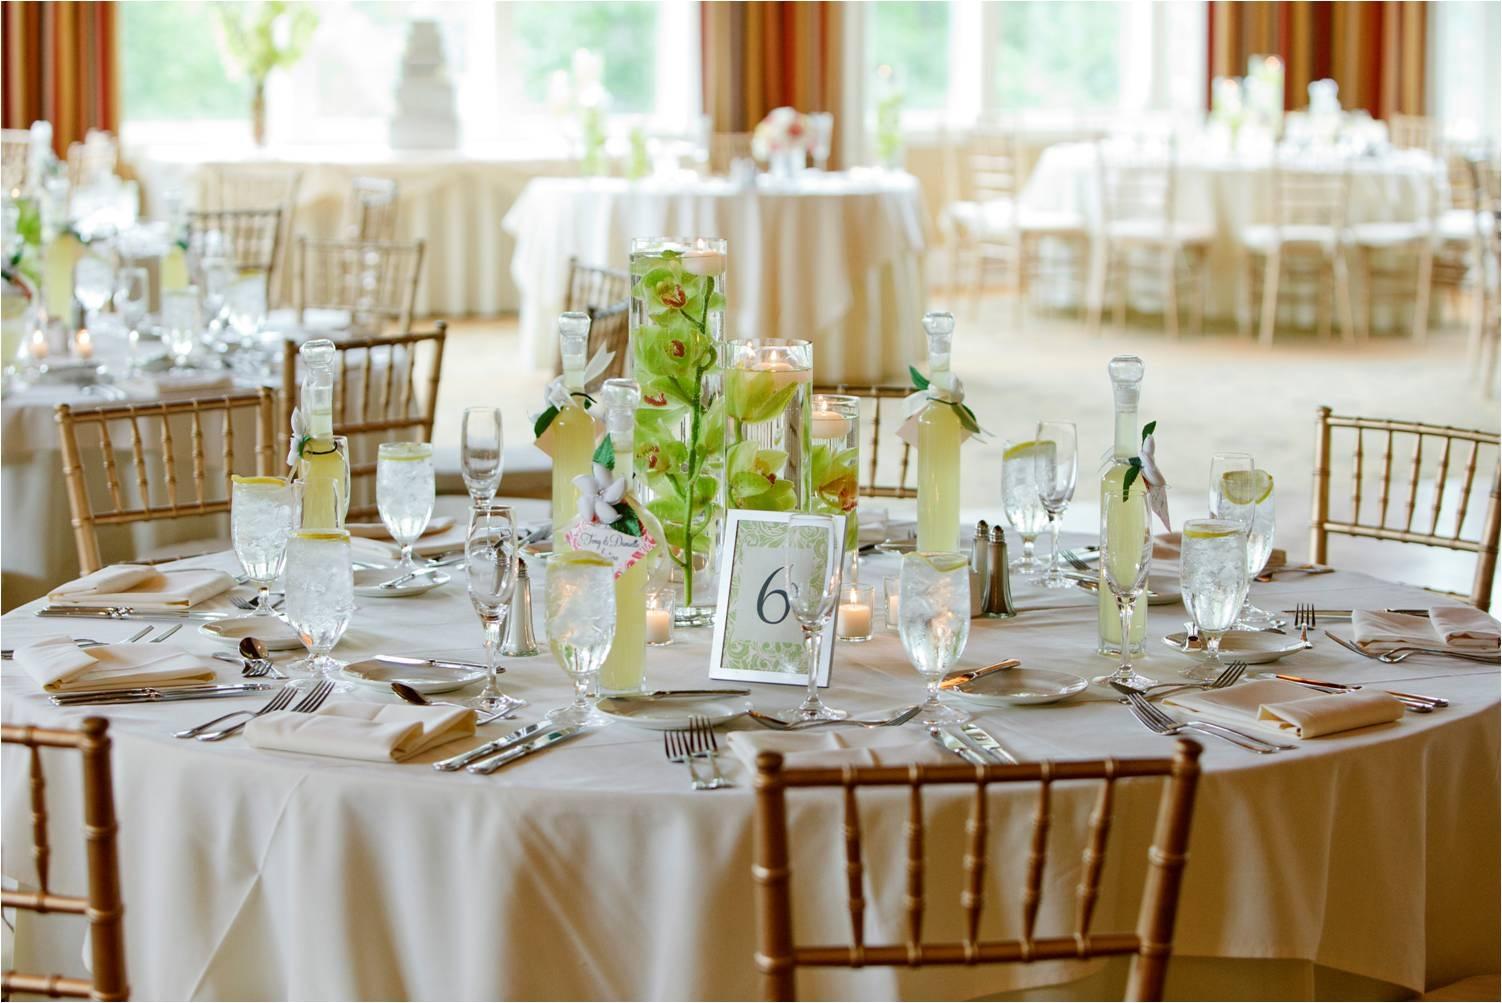 ivor cottn wedding linens Ivory Cotton Blend Linens Gold Chiavari Chairs